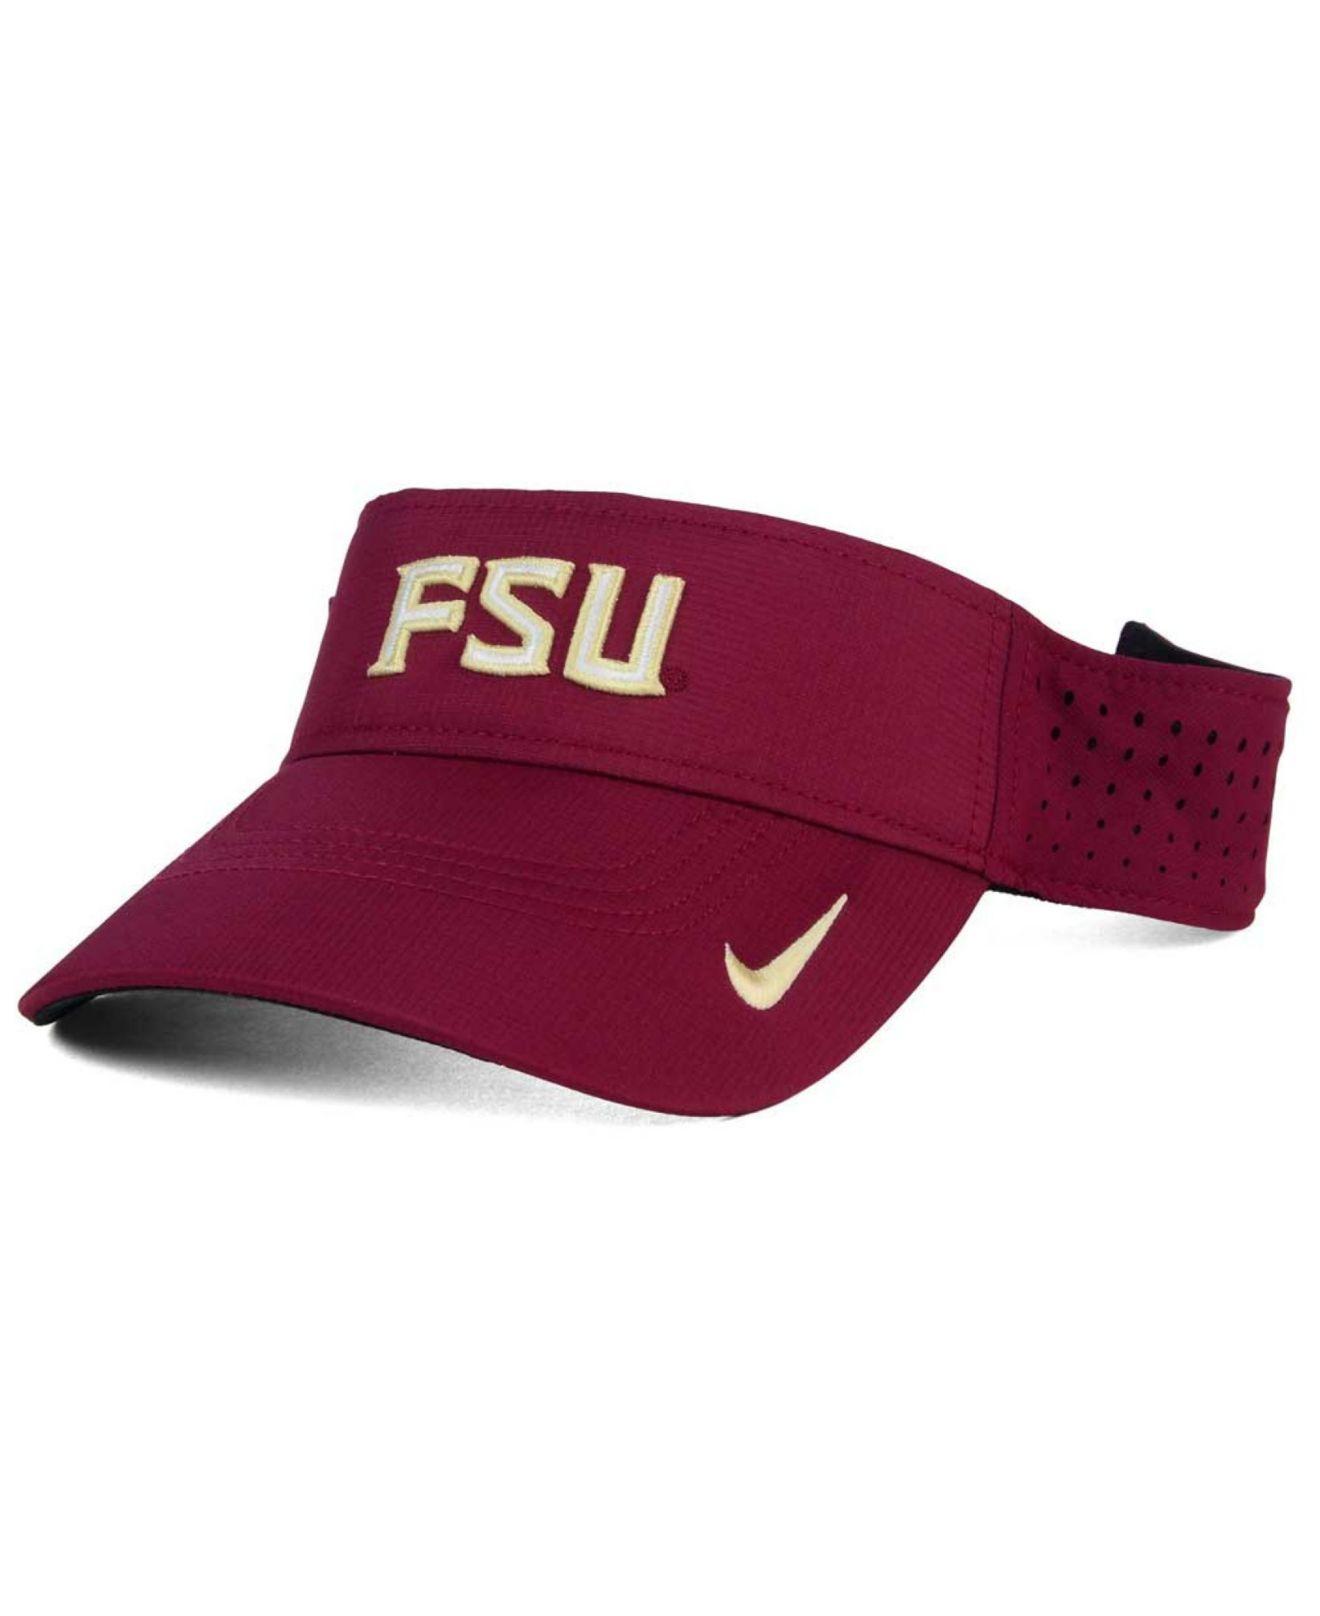 8bf28374942f5 Lyst - Nike Florida State Seminoles Dri-fit Vapor Visor in Purple